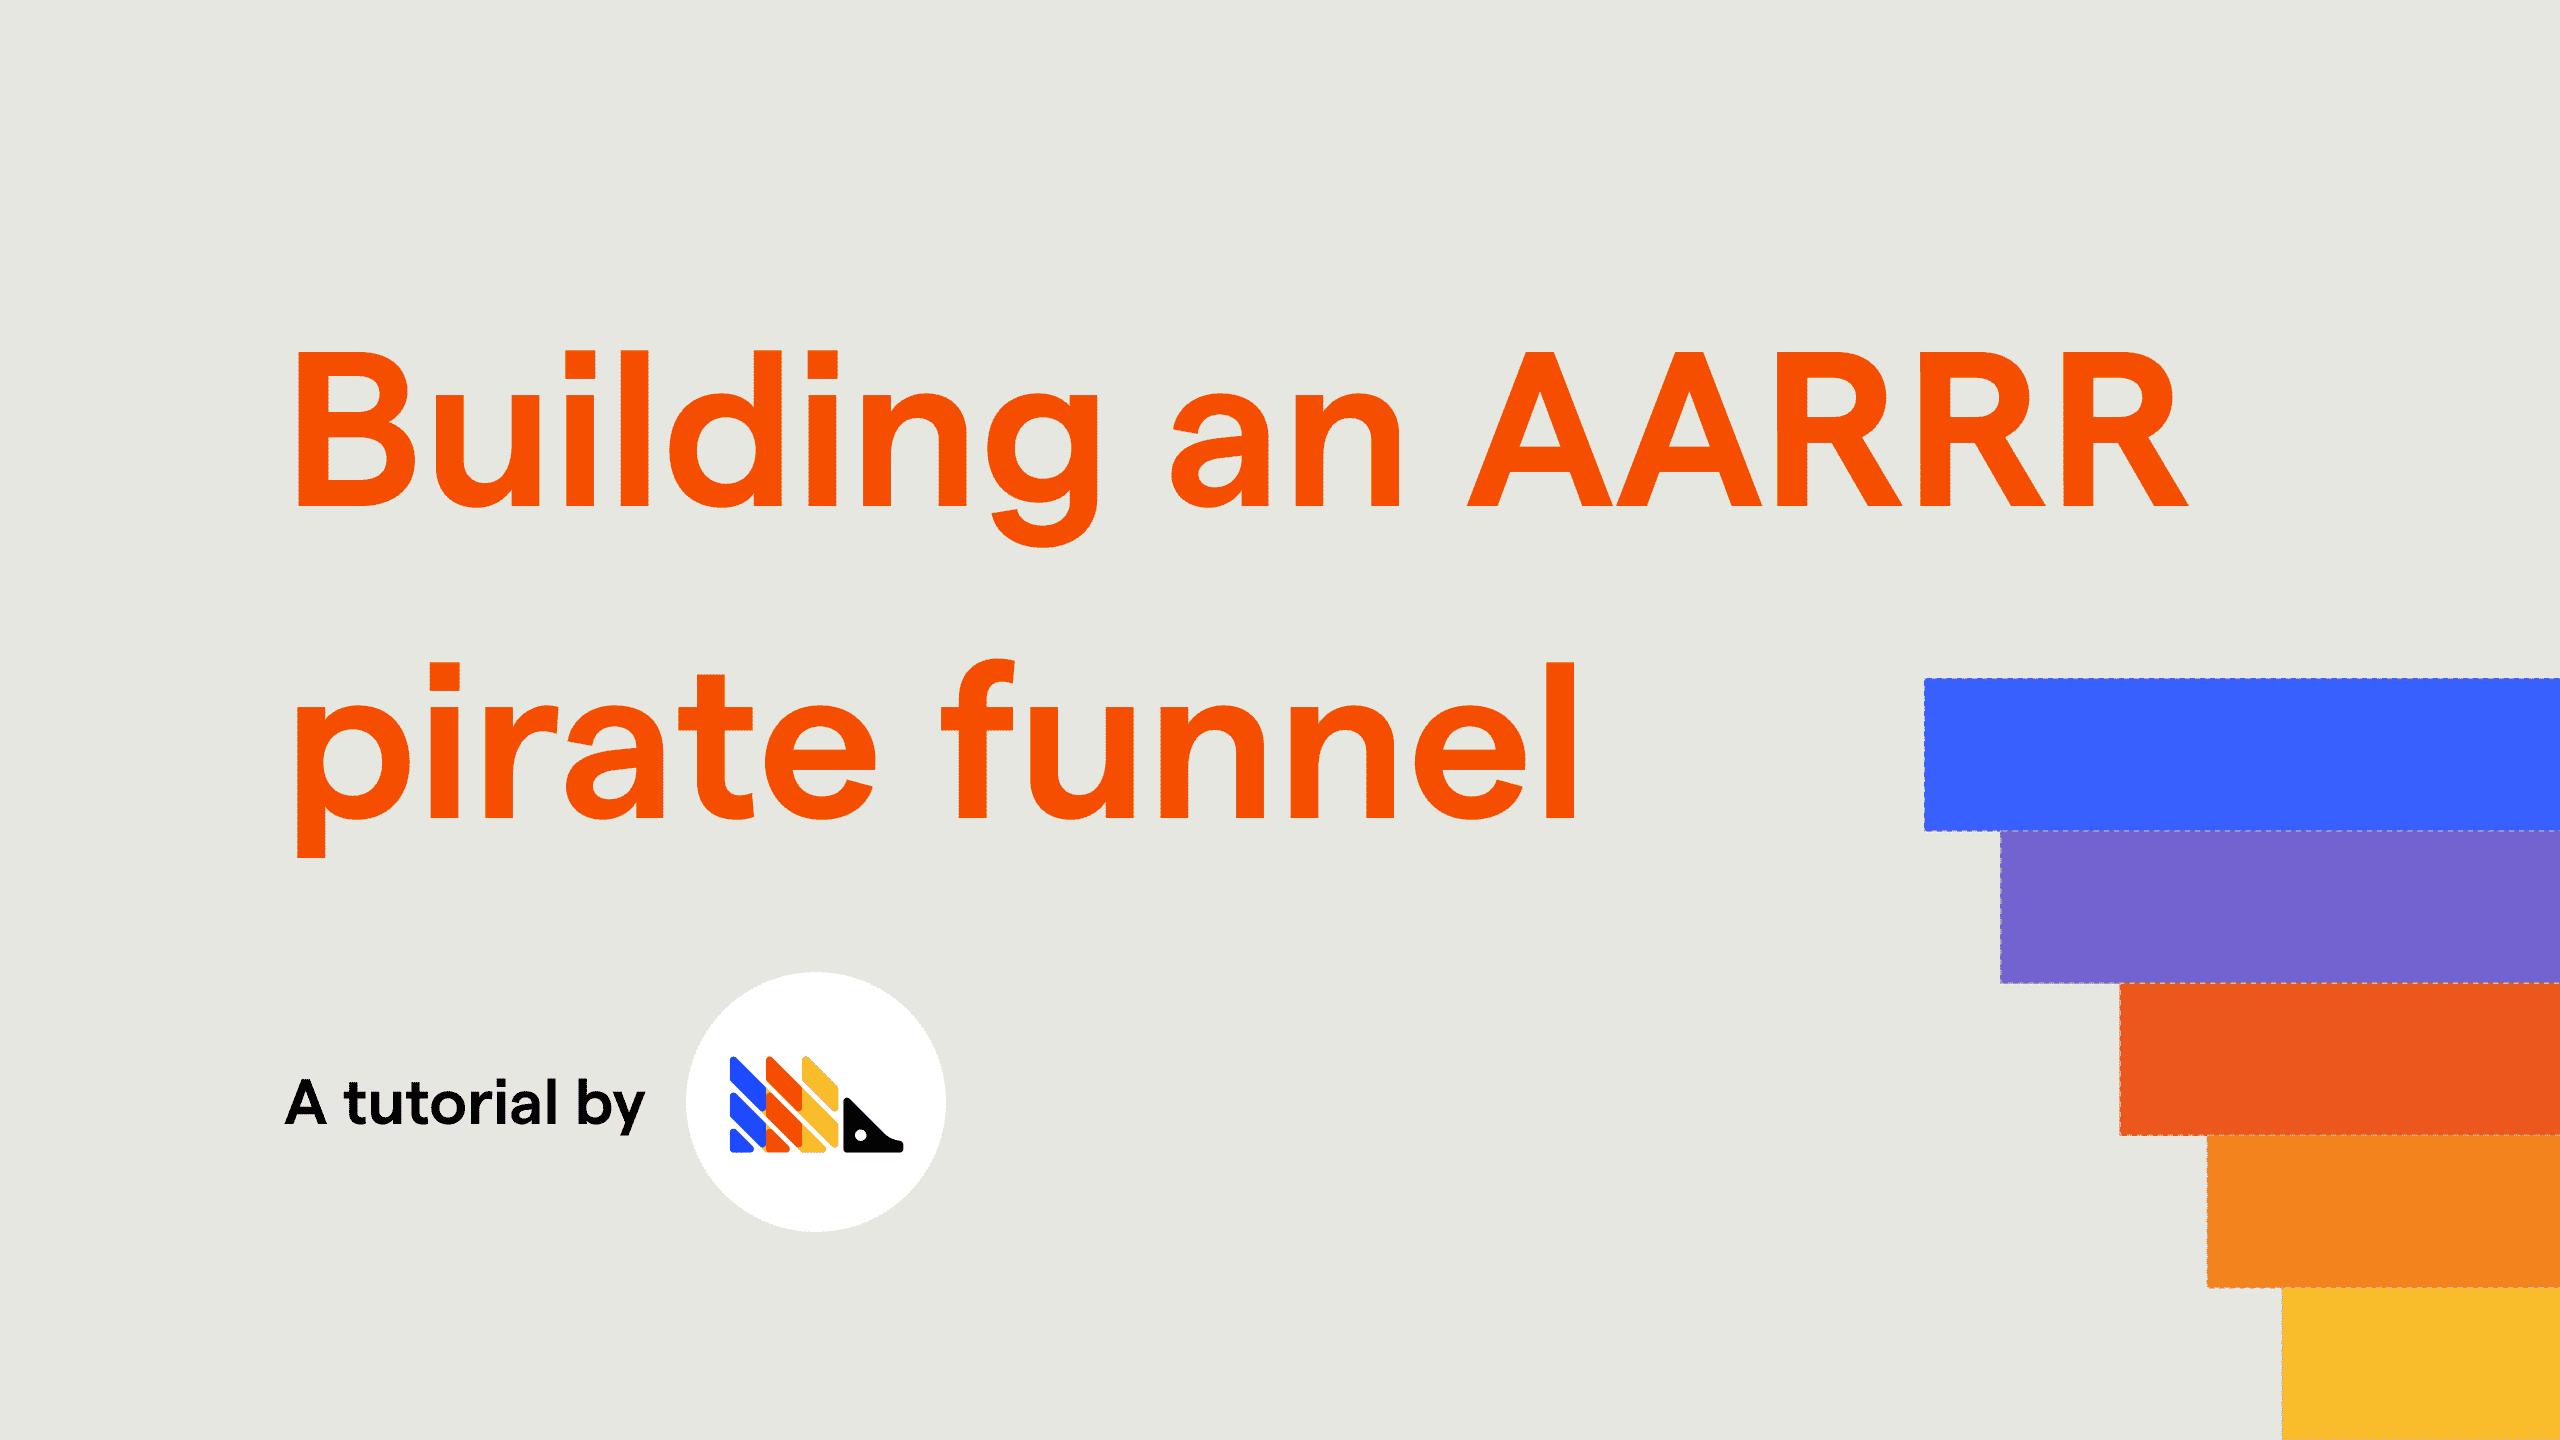 Building an AARRR pirate funnel